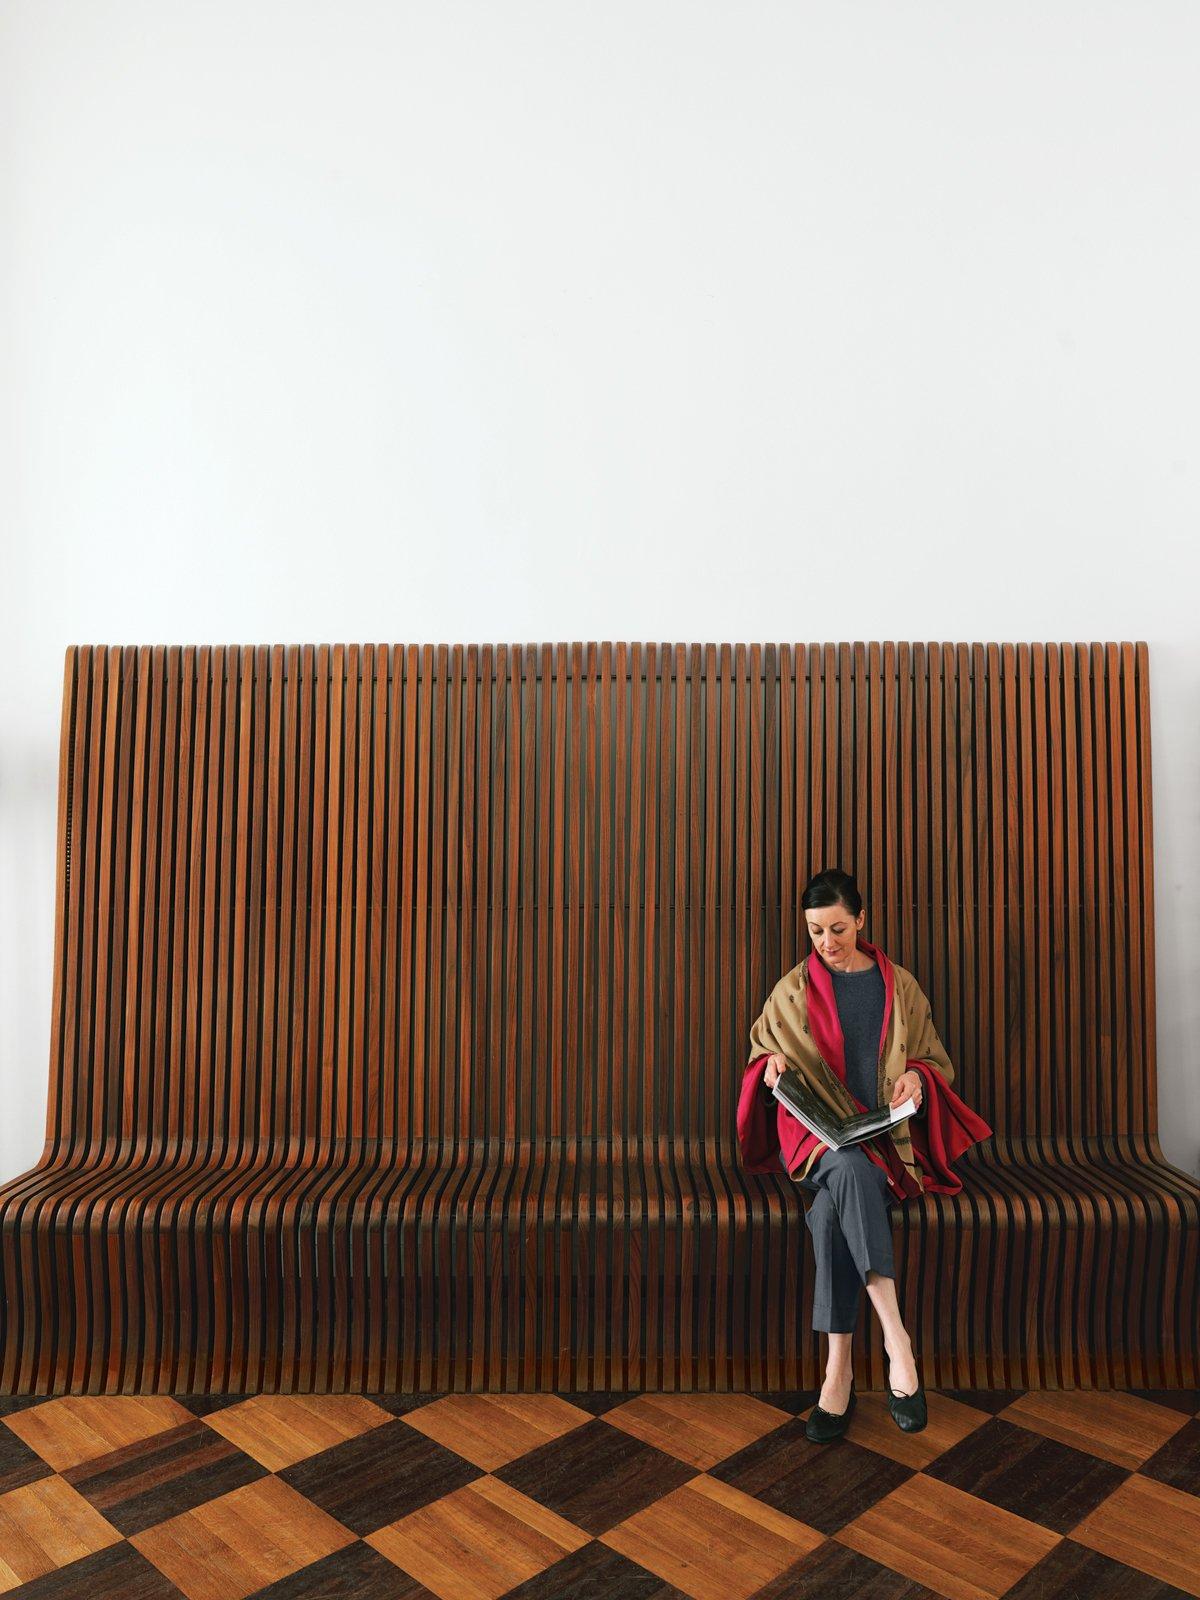 #seatingdesign #vintage #rosewood #bench #RichardSeifert #Brussels #mansion   100+ Best Modern Seating Designs